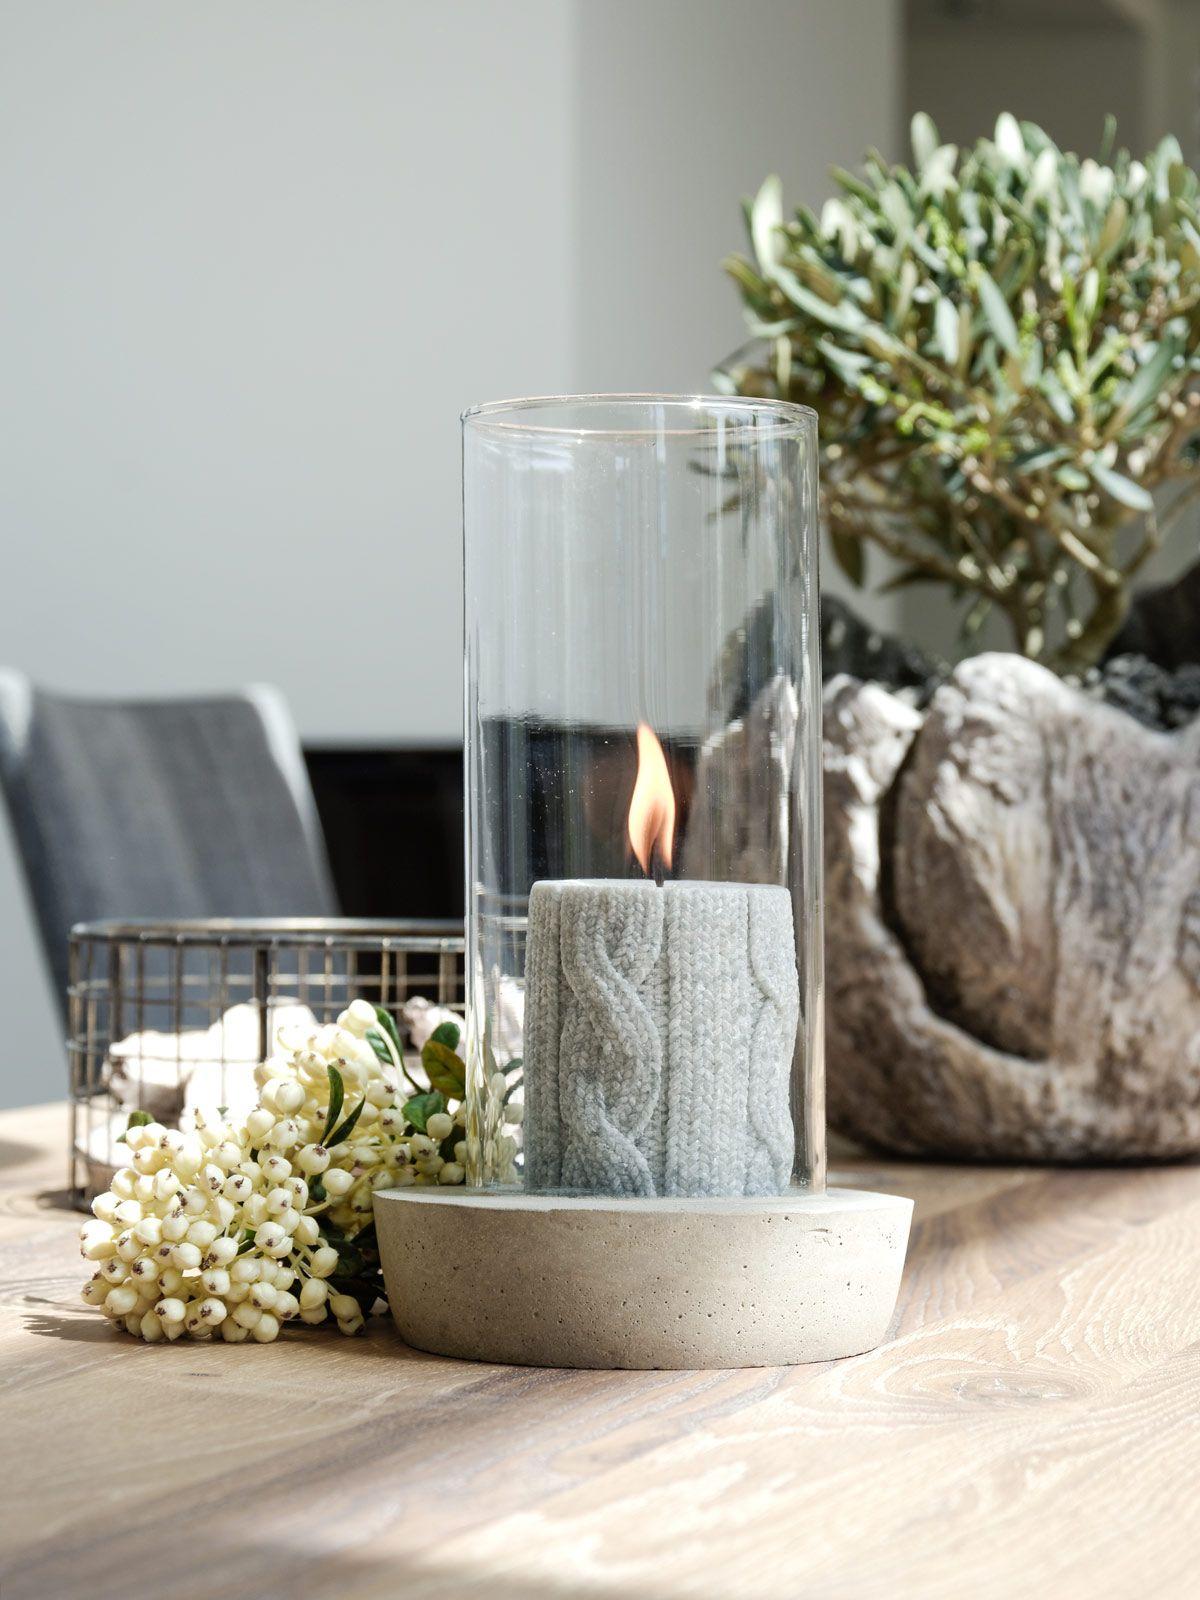 diy mx living diy windlicht glas kerzenhalter glas und beton diy. Black Bedroom Furniture Sets. Home Design Ideas